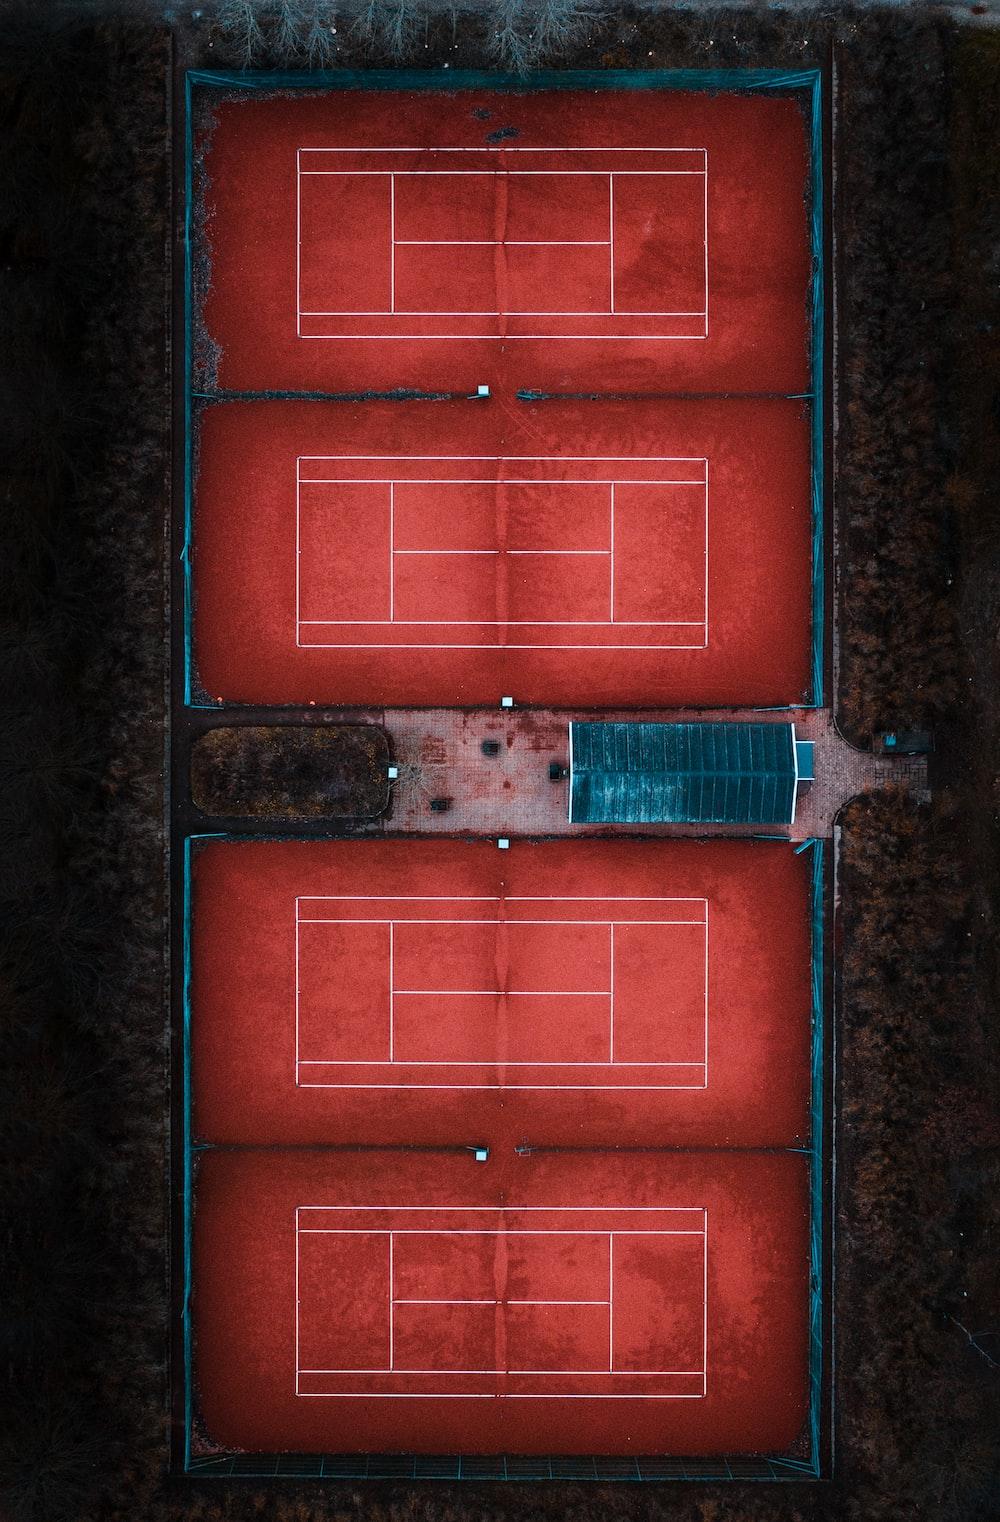 red court illustration